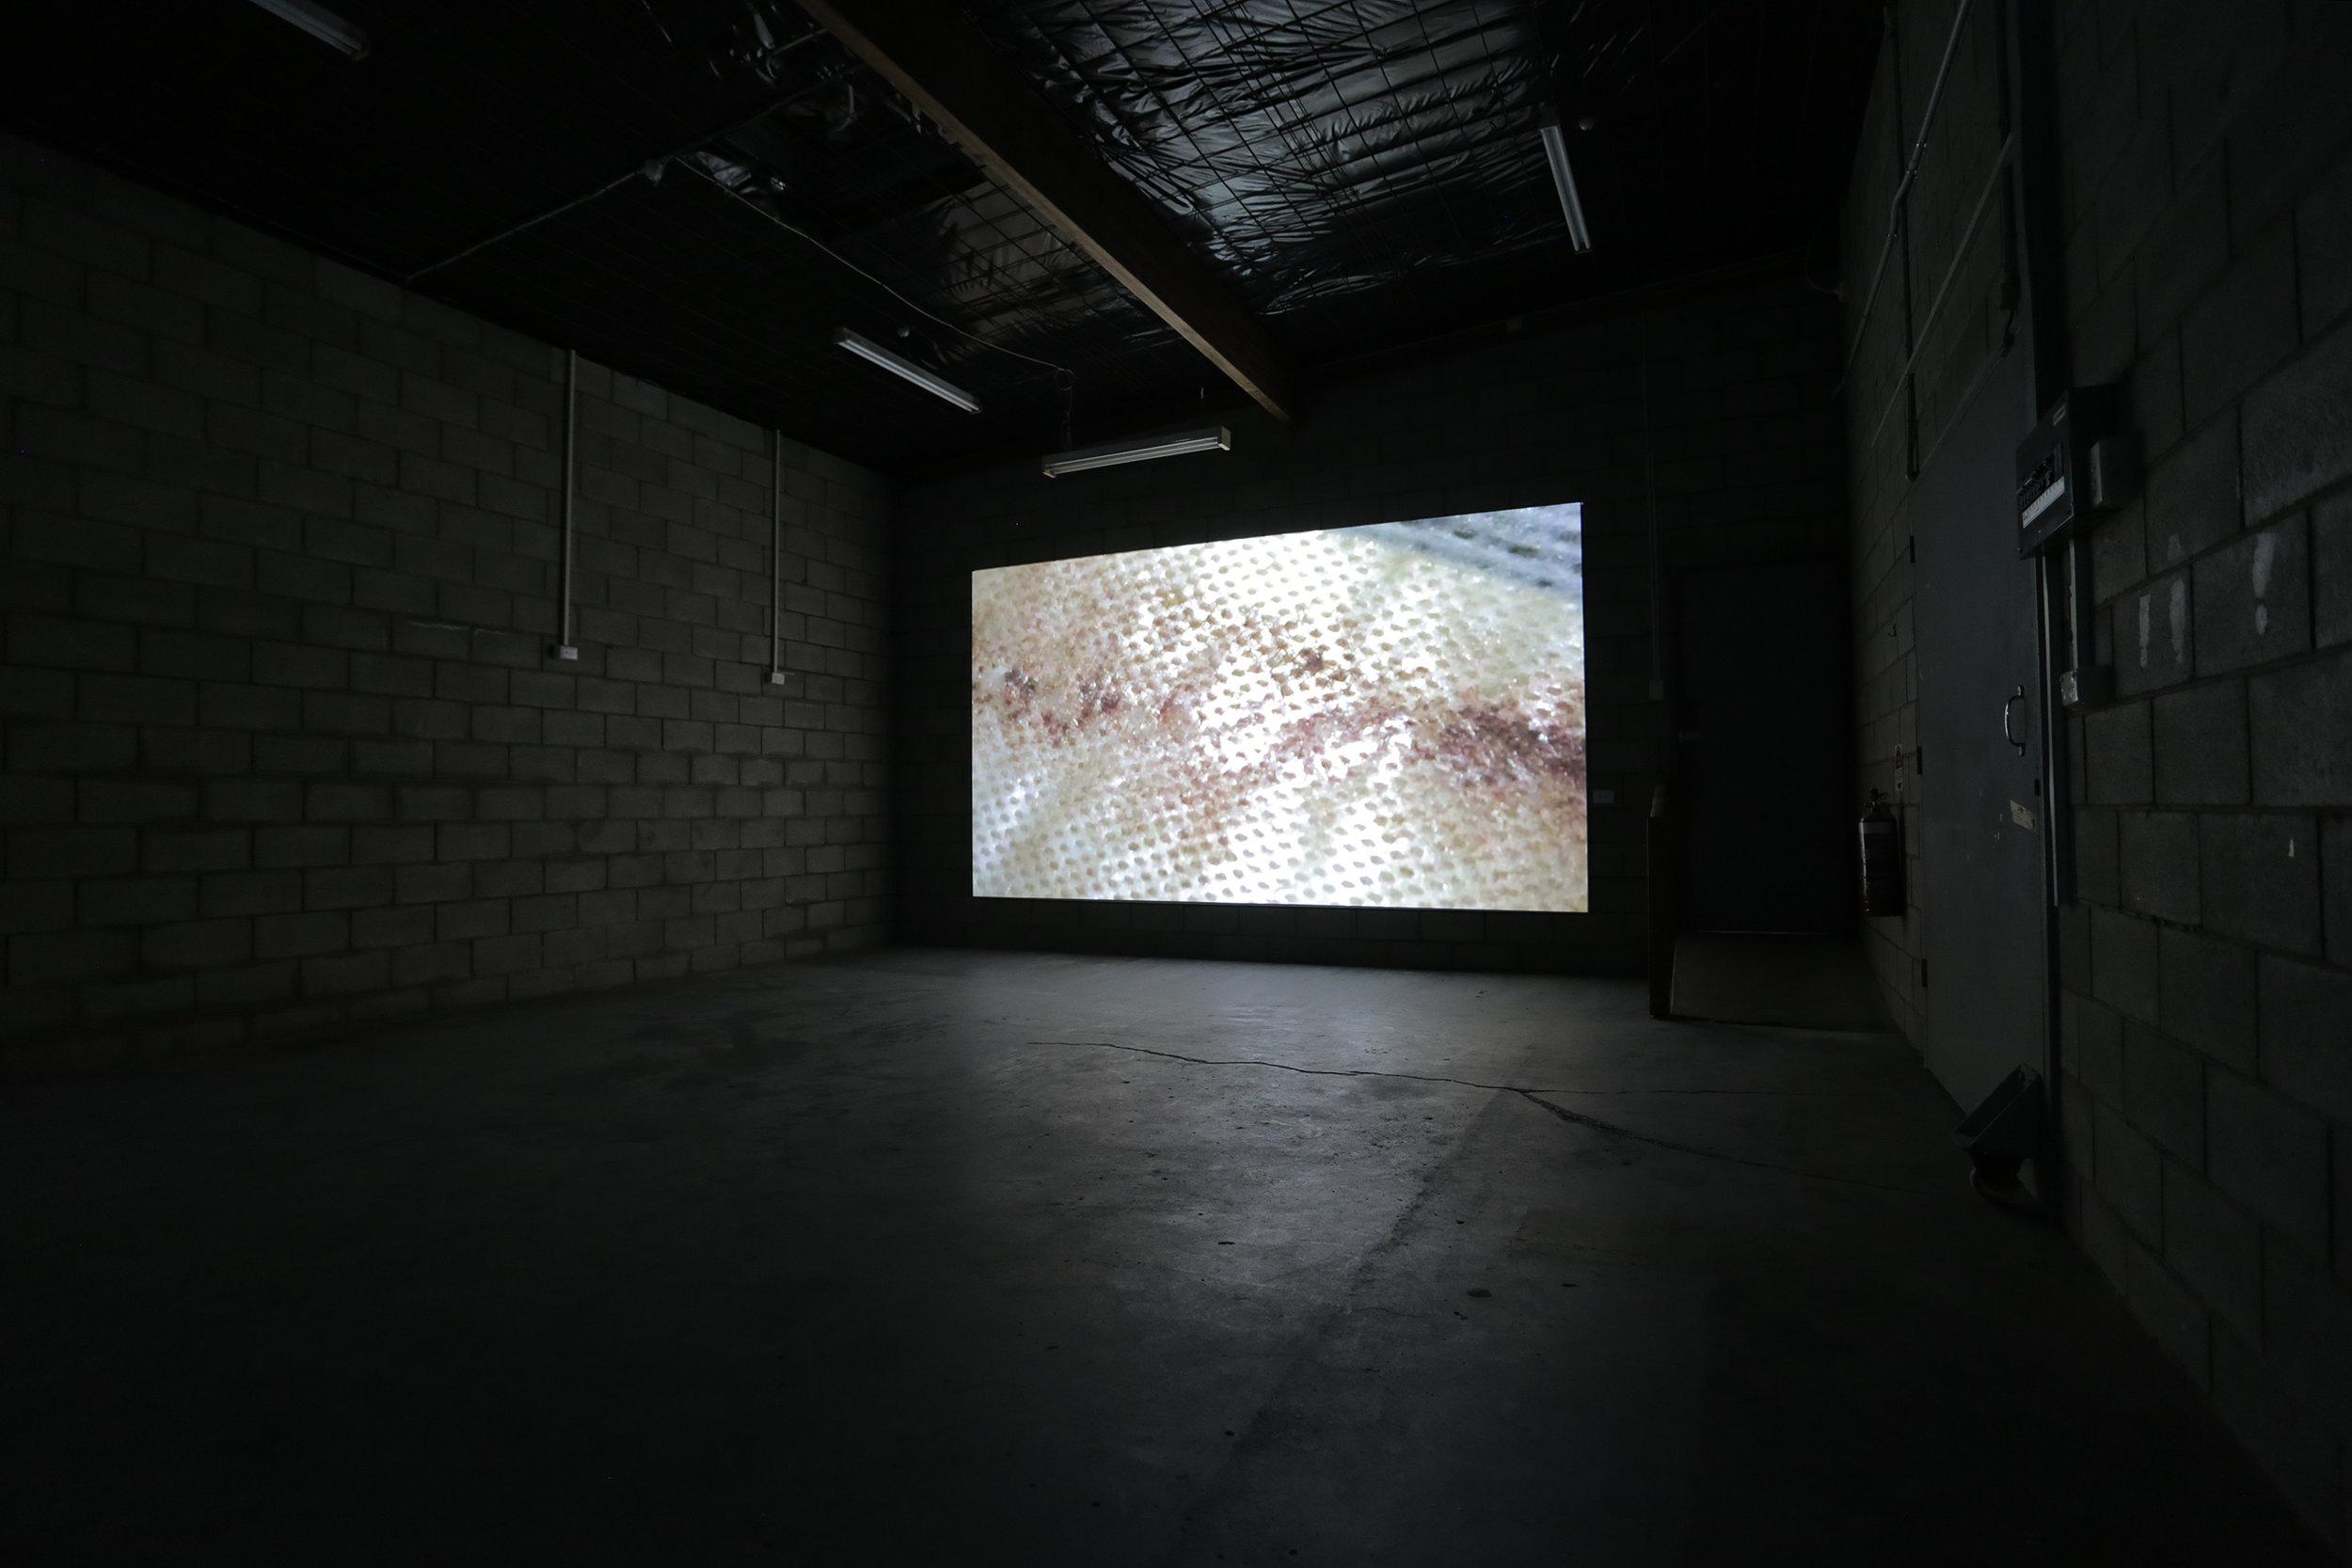 Bloodstain  2016, single channel HD digital video projection.  Photograph by Llewellyn Millhouse.